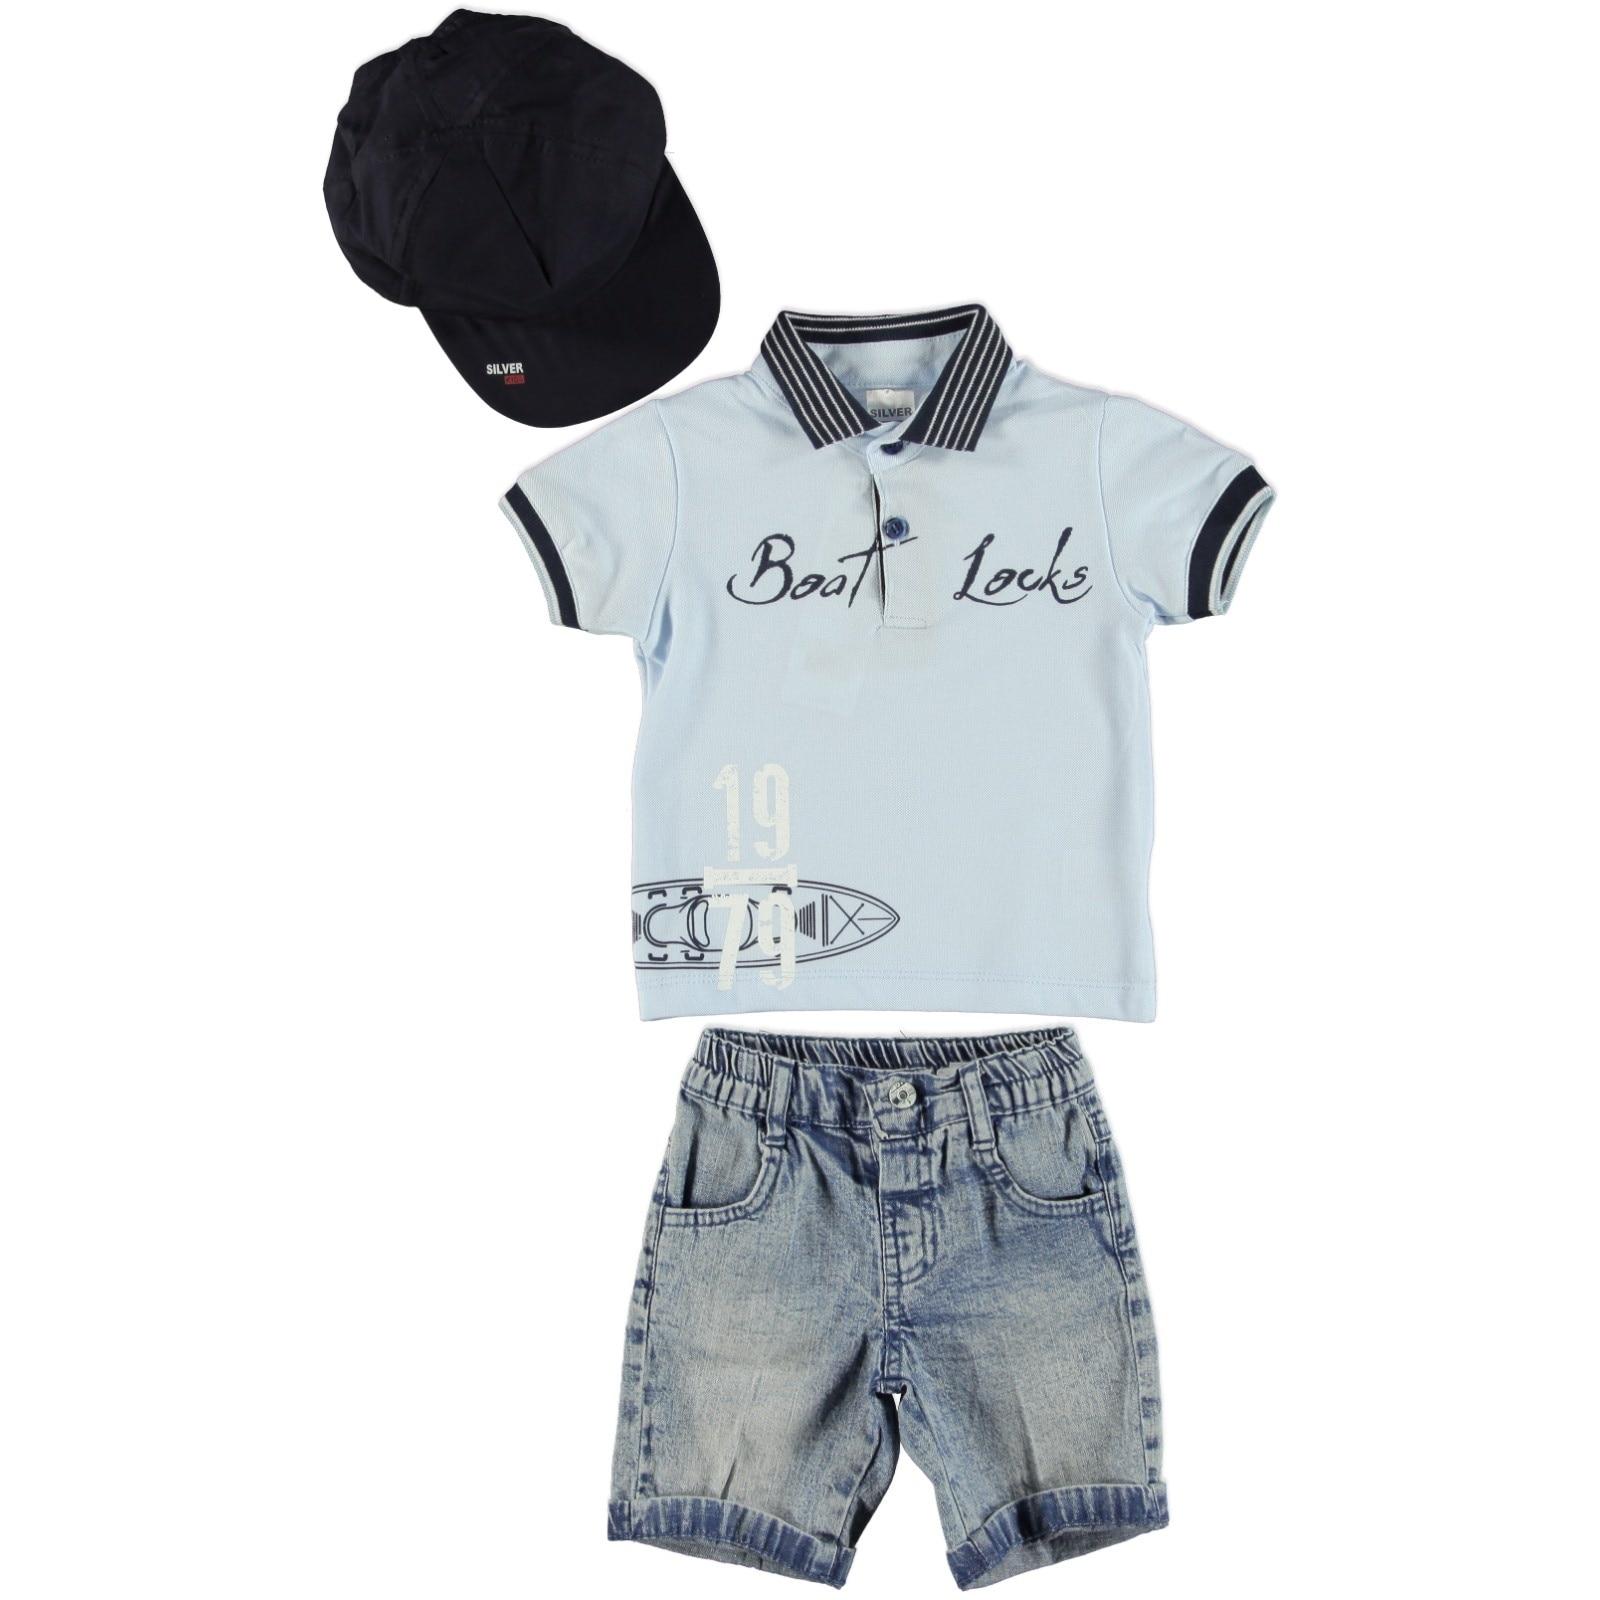 Ebebek Bombili bebé bota cerraduras Polo Camiseta de cuello de Denim Set 3 uds